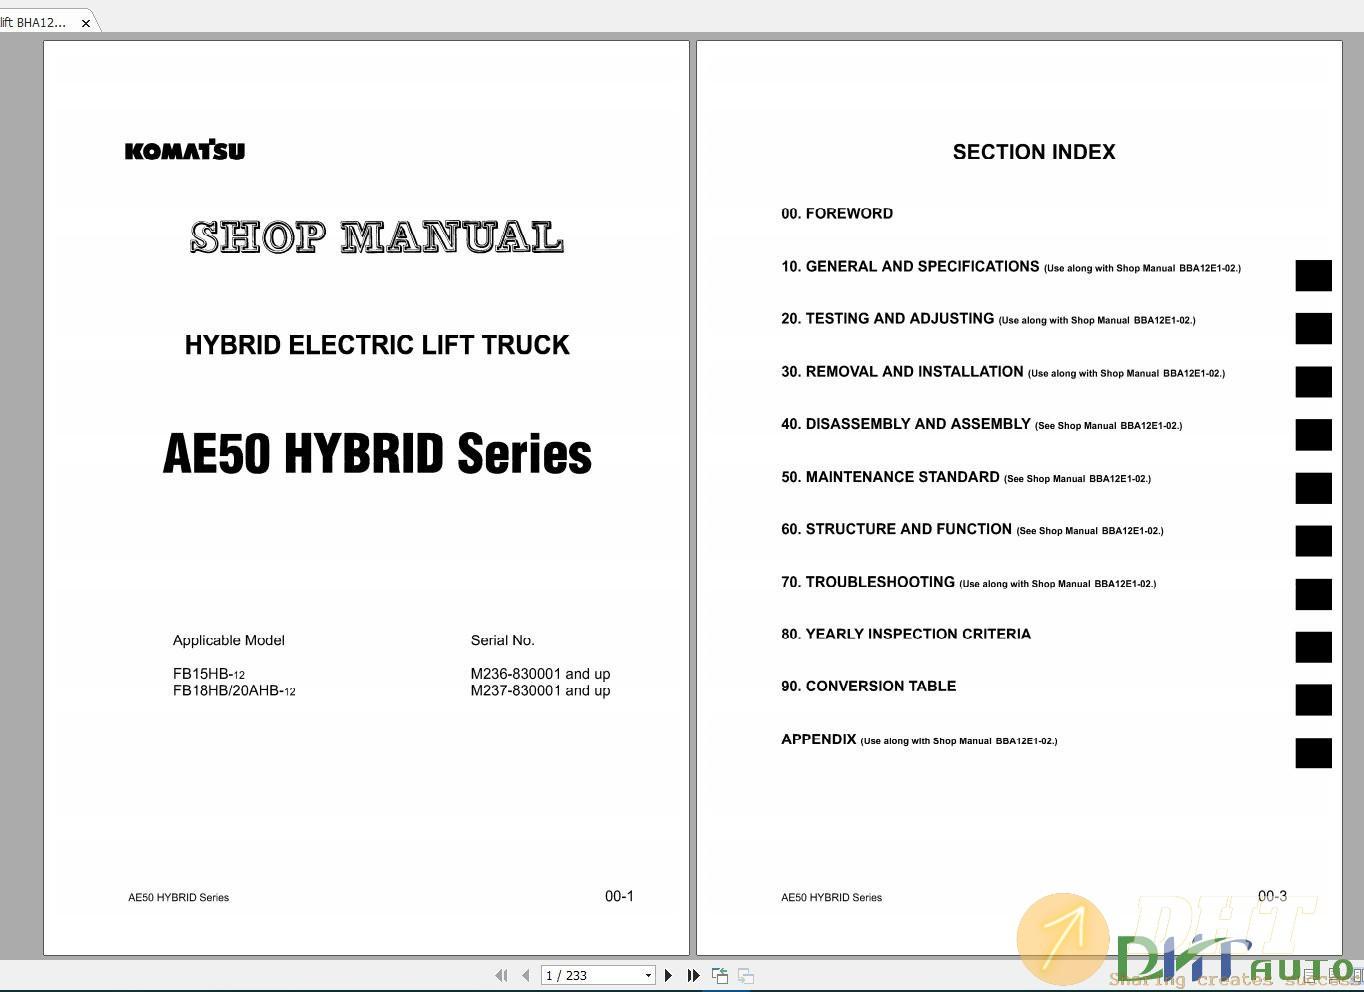 Komatsu-Forklift-Shop-Manual-PDF-Full-6.jpg